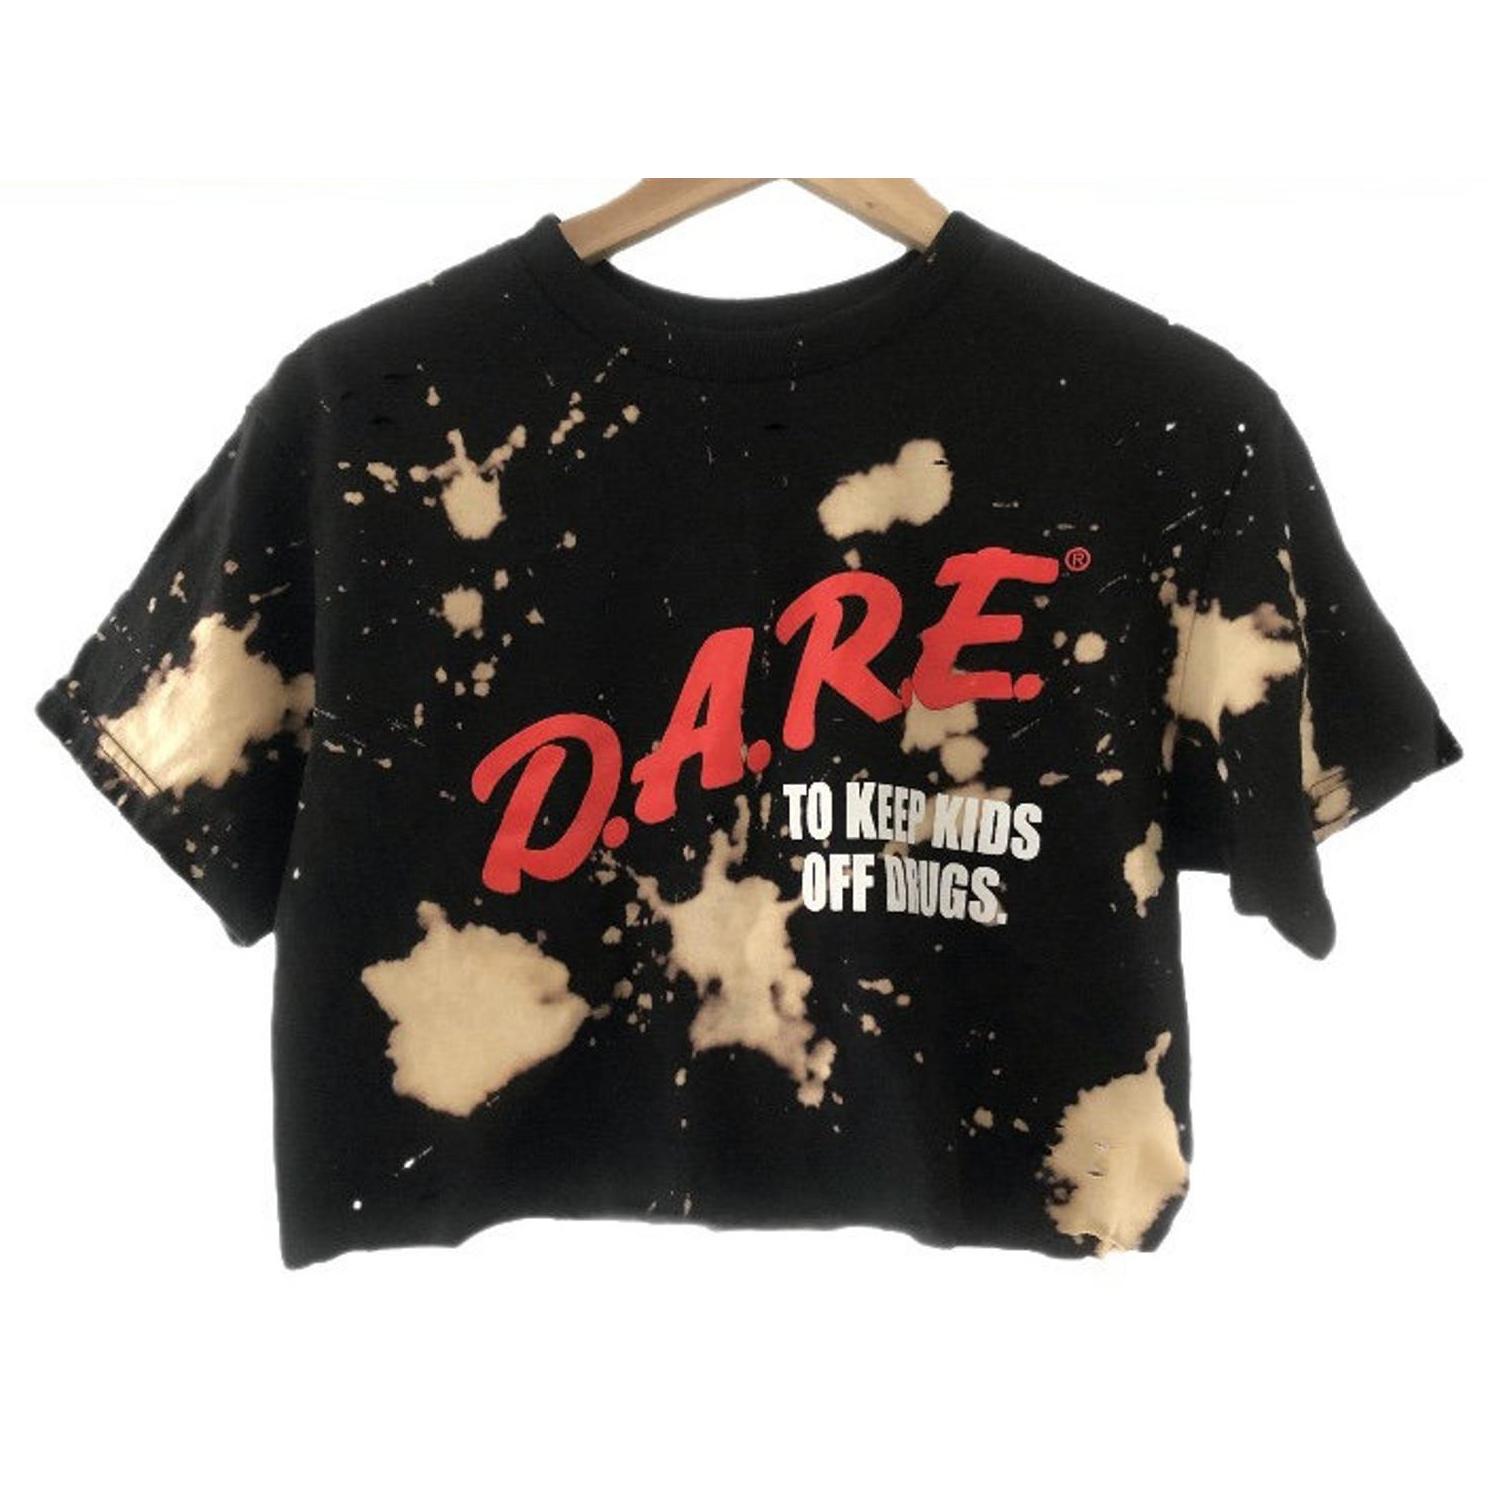 D.A.R.E Crop Top